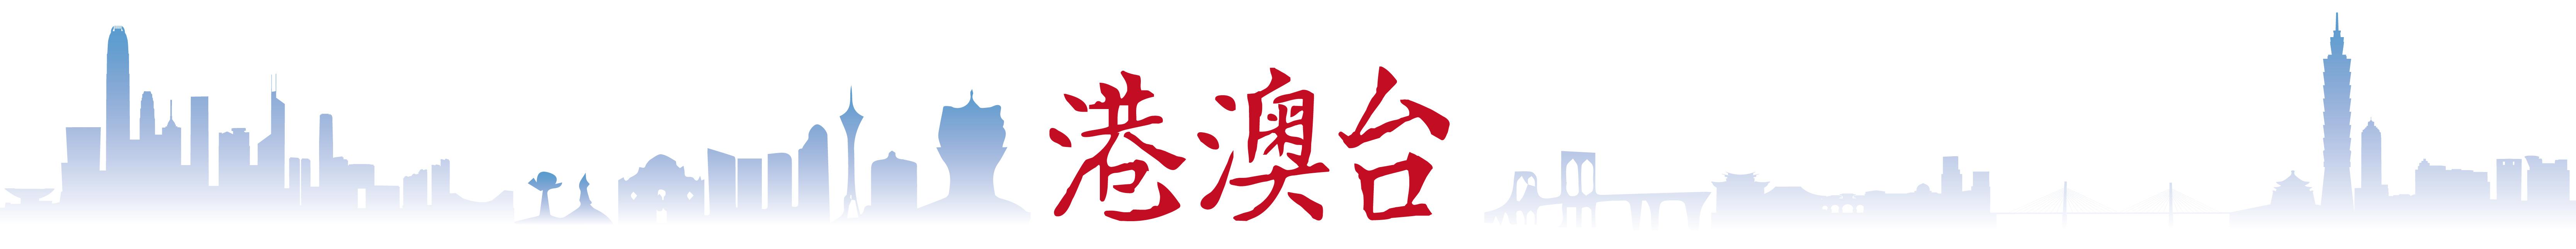 http://www.edaojz.cn/loushifangchan/130565.html